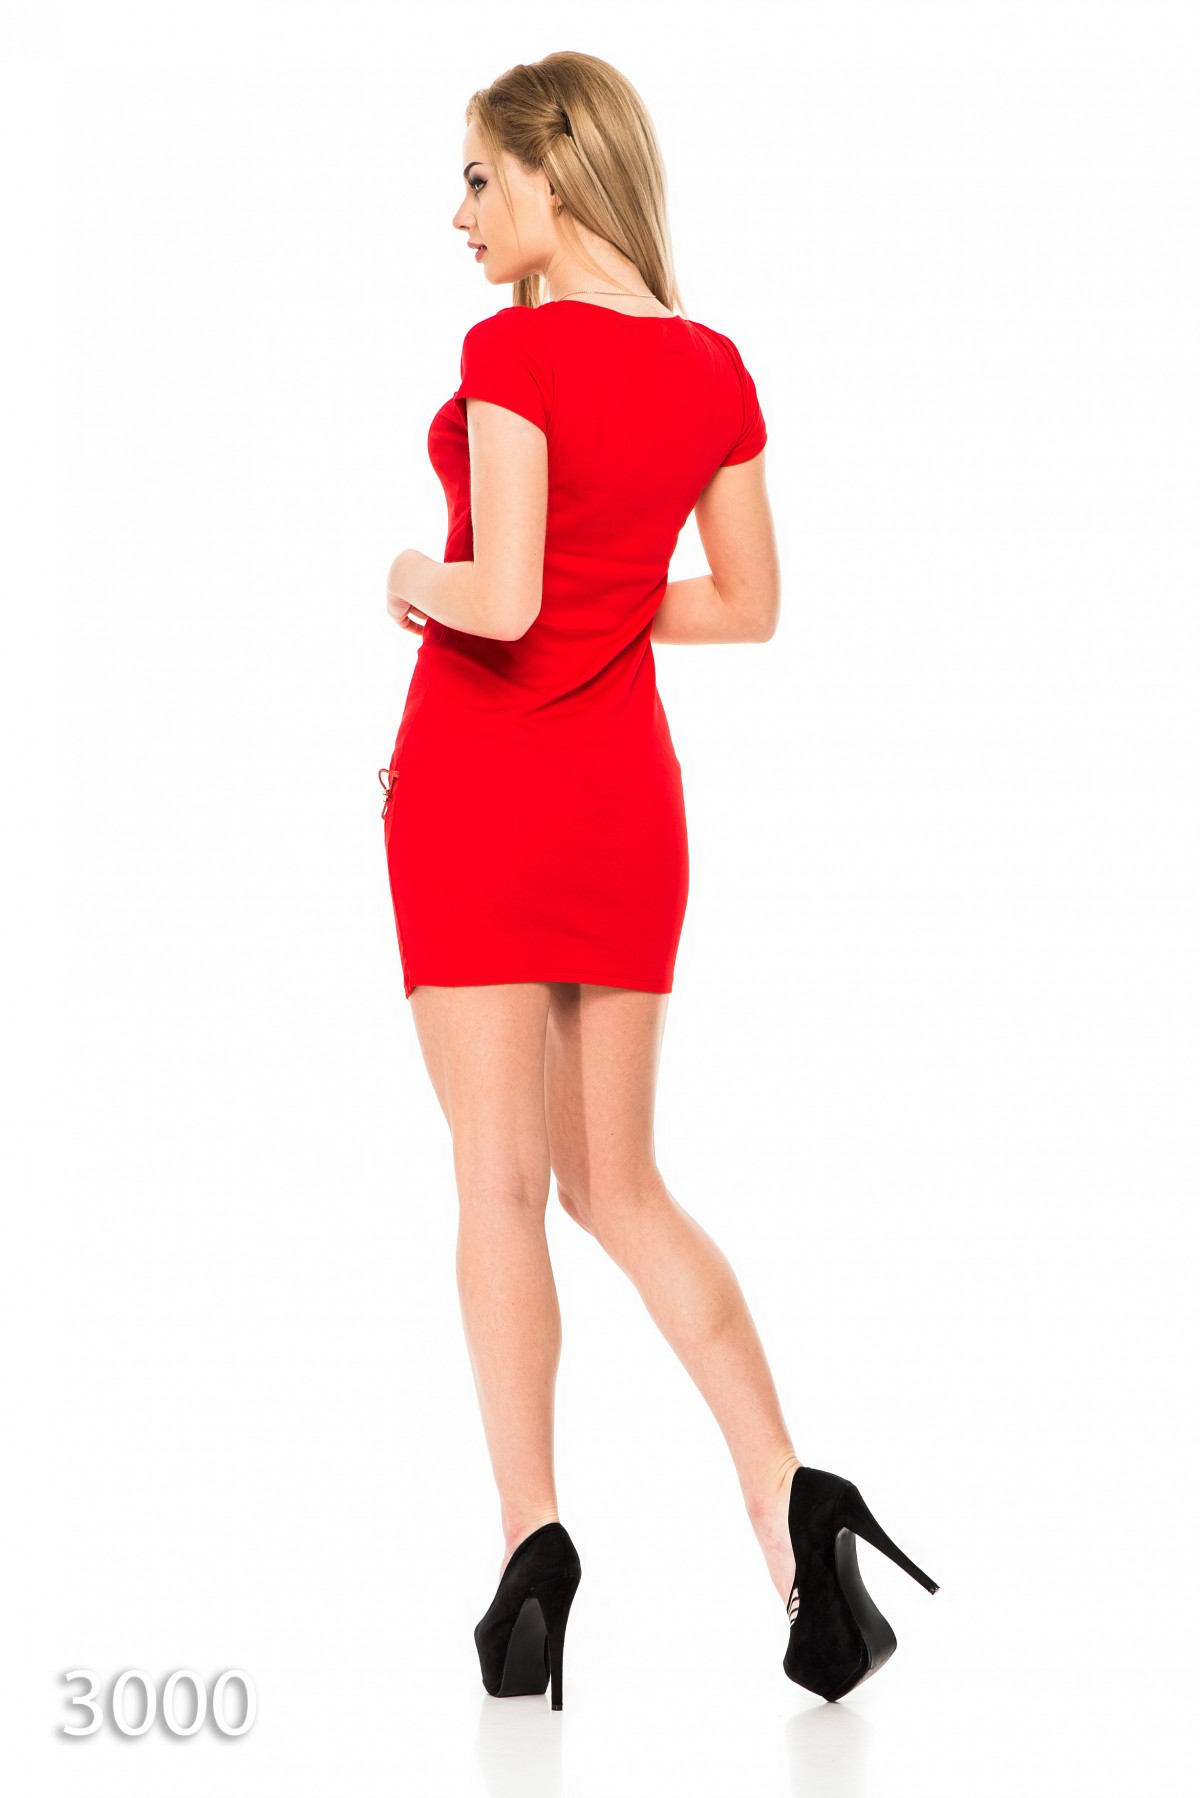 1cc73ecd117 ... Красное платье-футболка со шнуровкой в тон на бедре  348 грн. фото 4